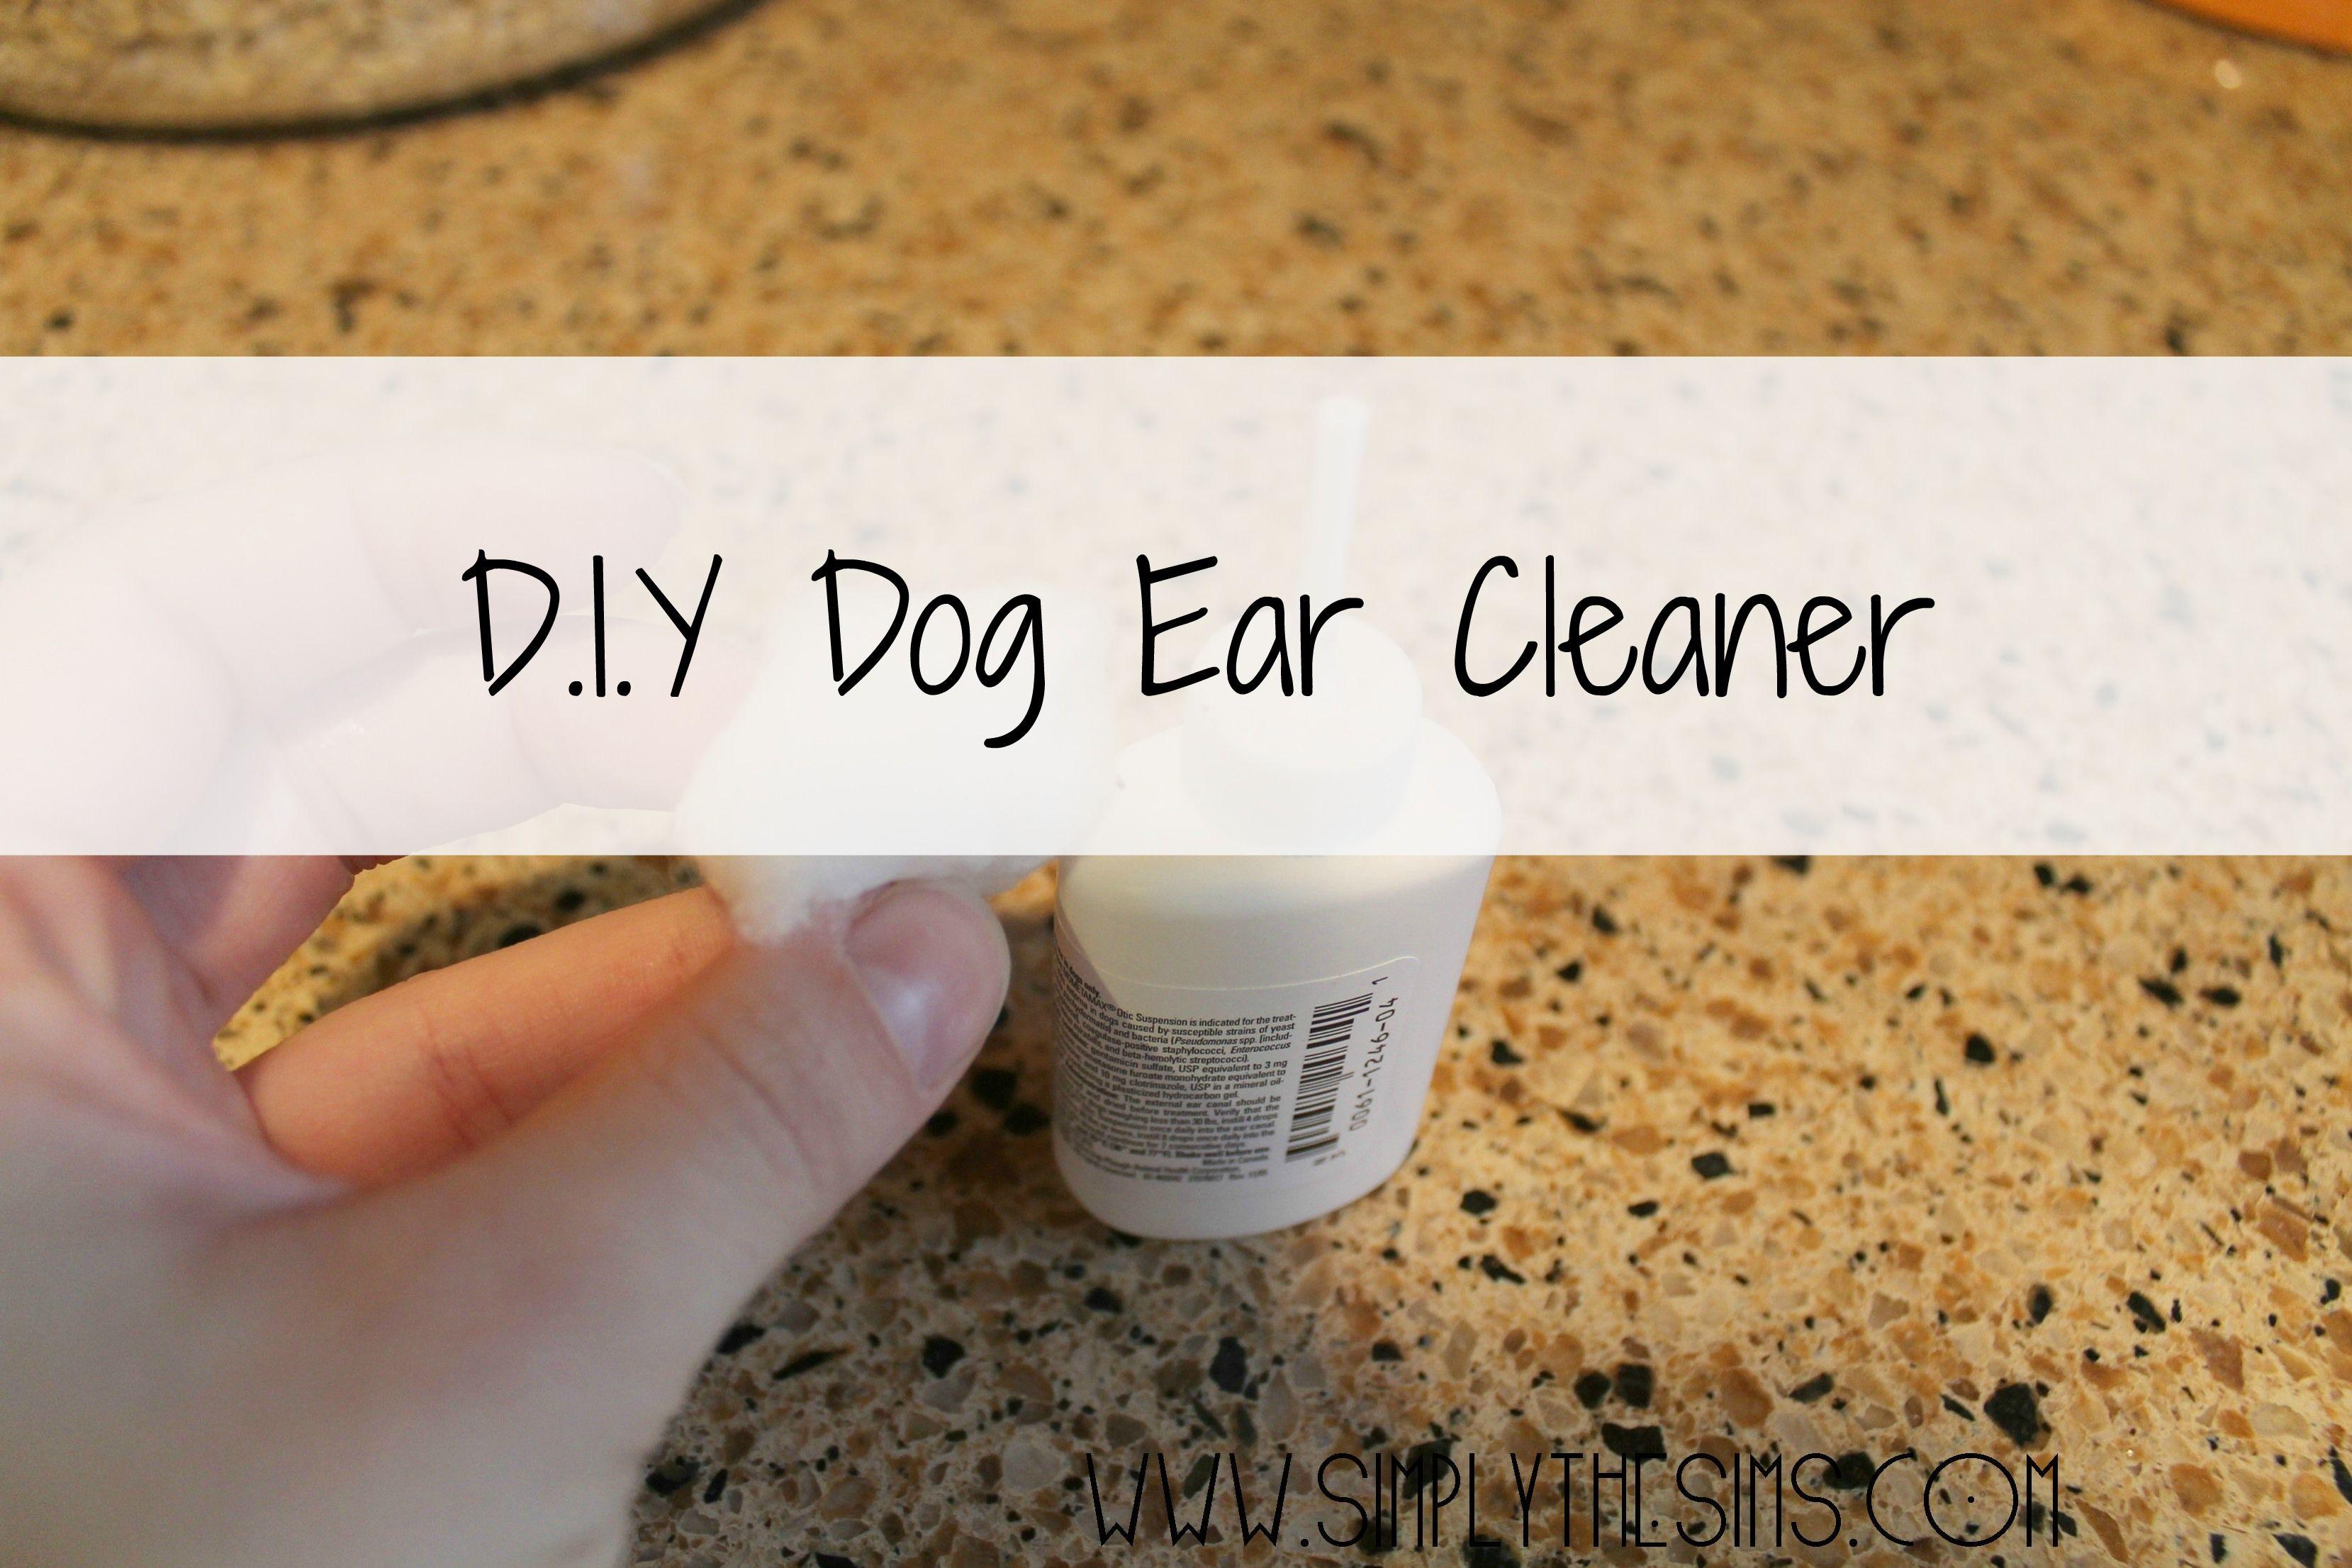 Dog Ear Cleaner distilled white vinegar, water and tea